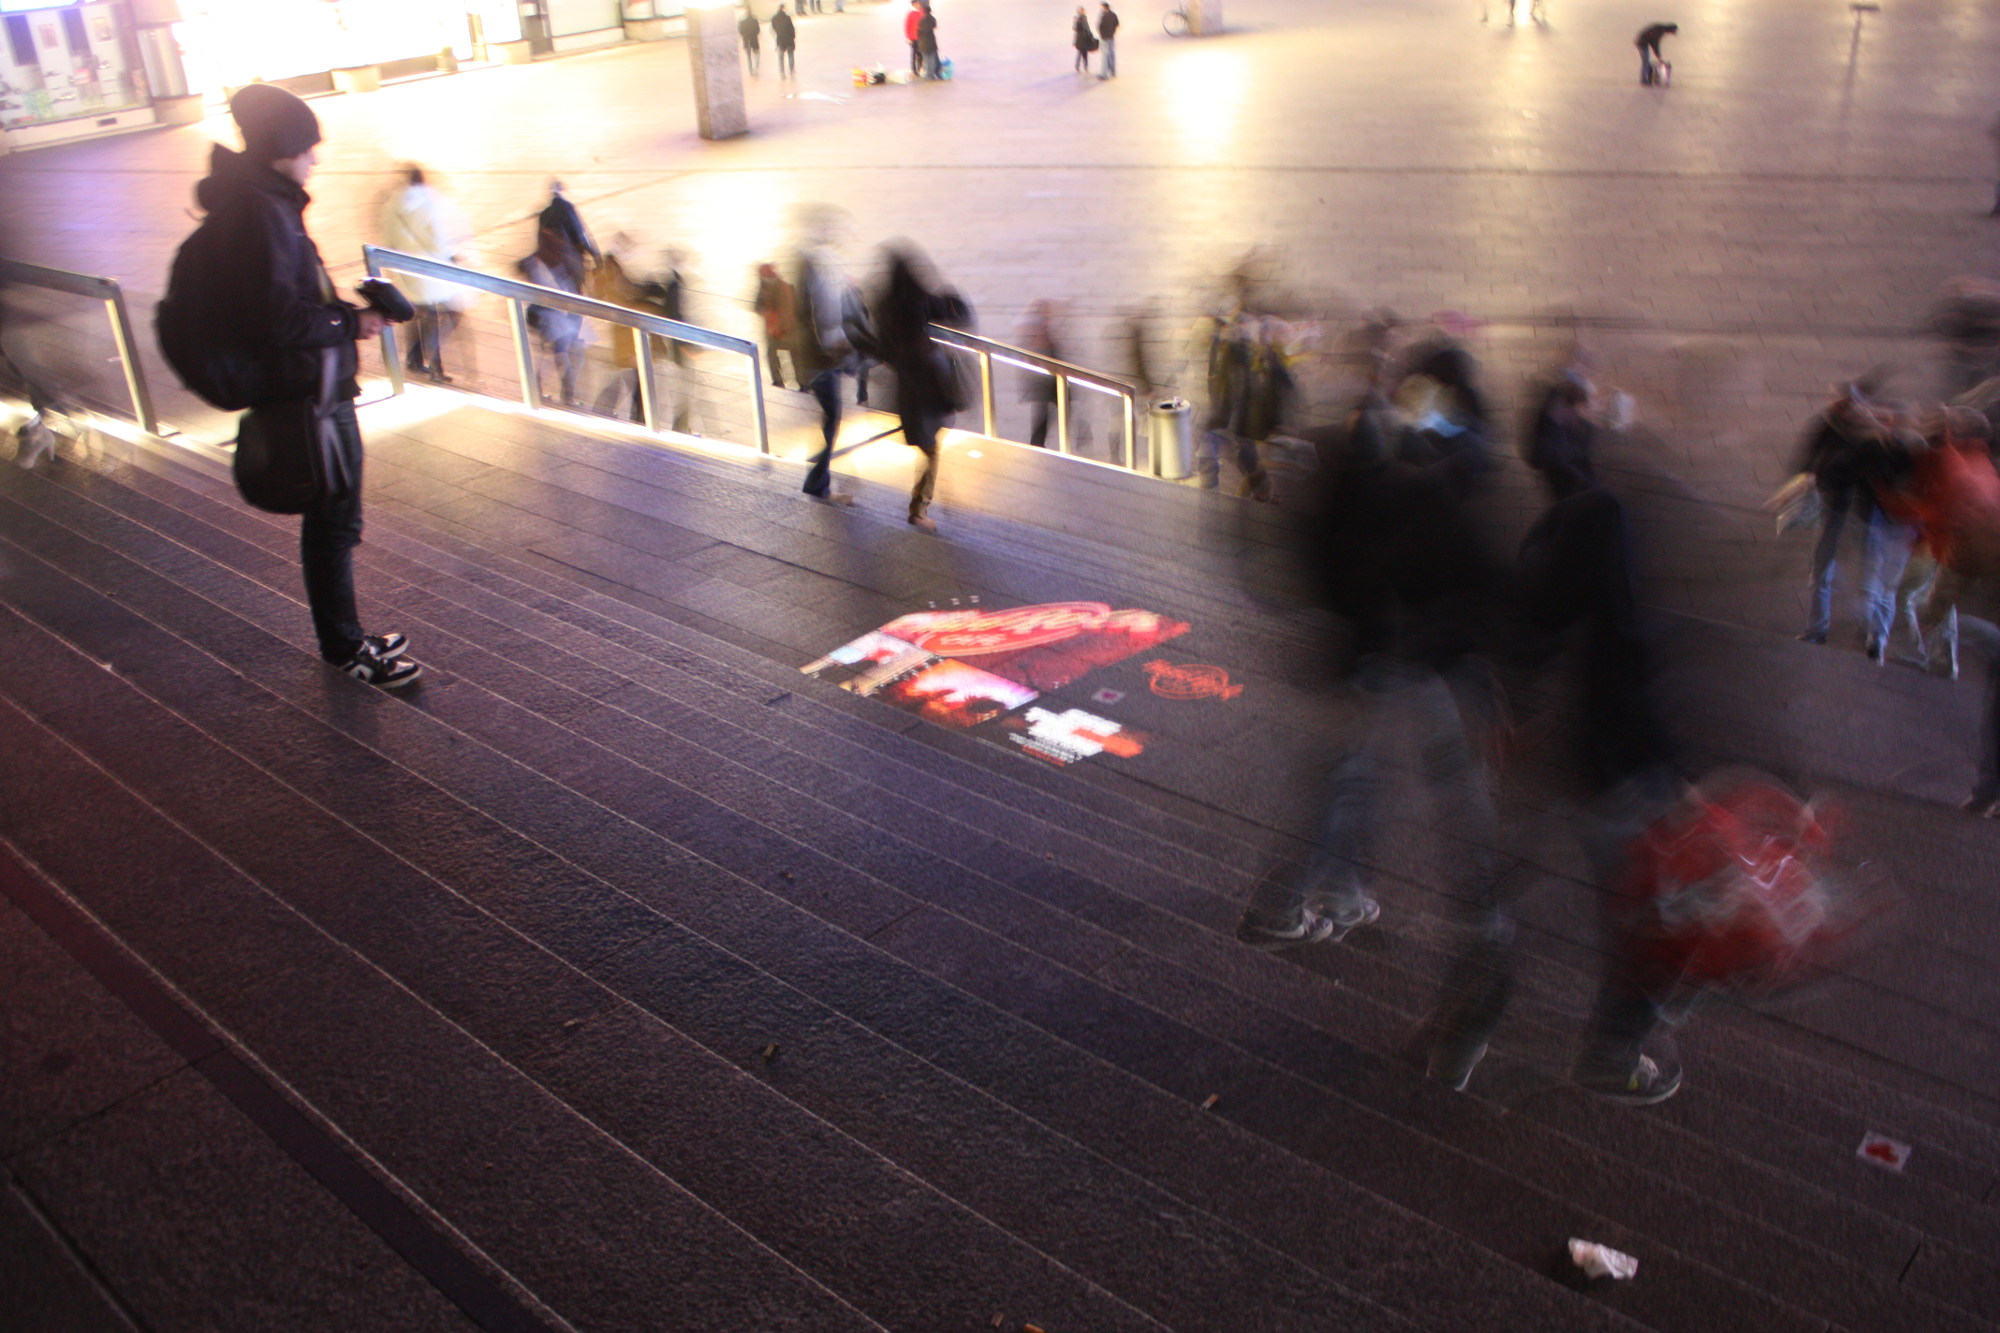 Mobile Projektion-Werbung - BeamerMan mit Lichtprojektion via Handbeamer